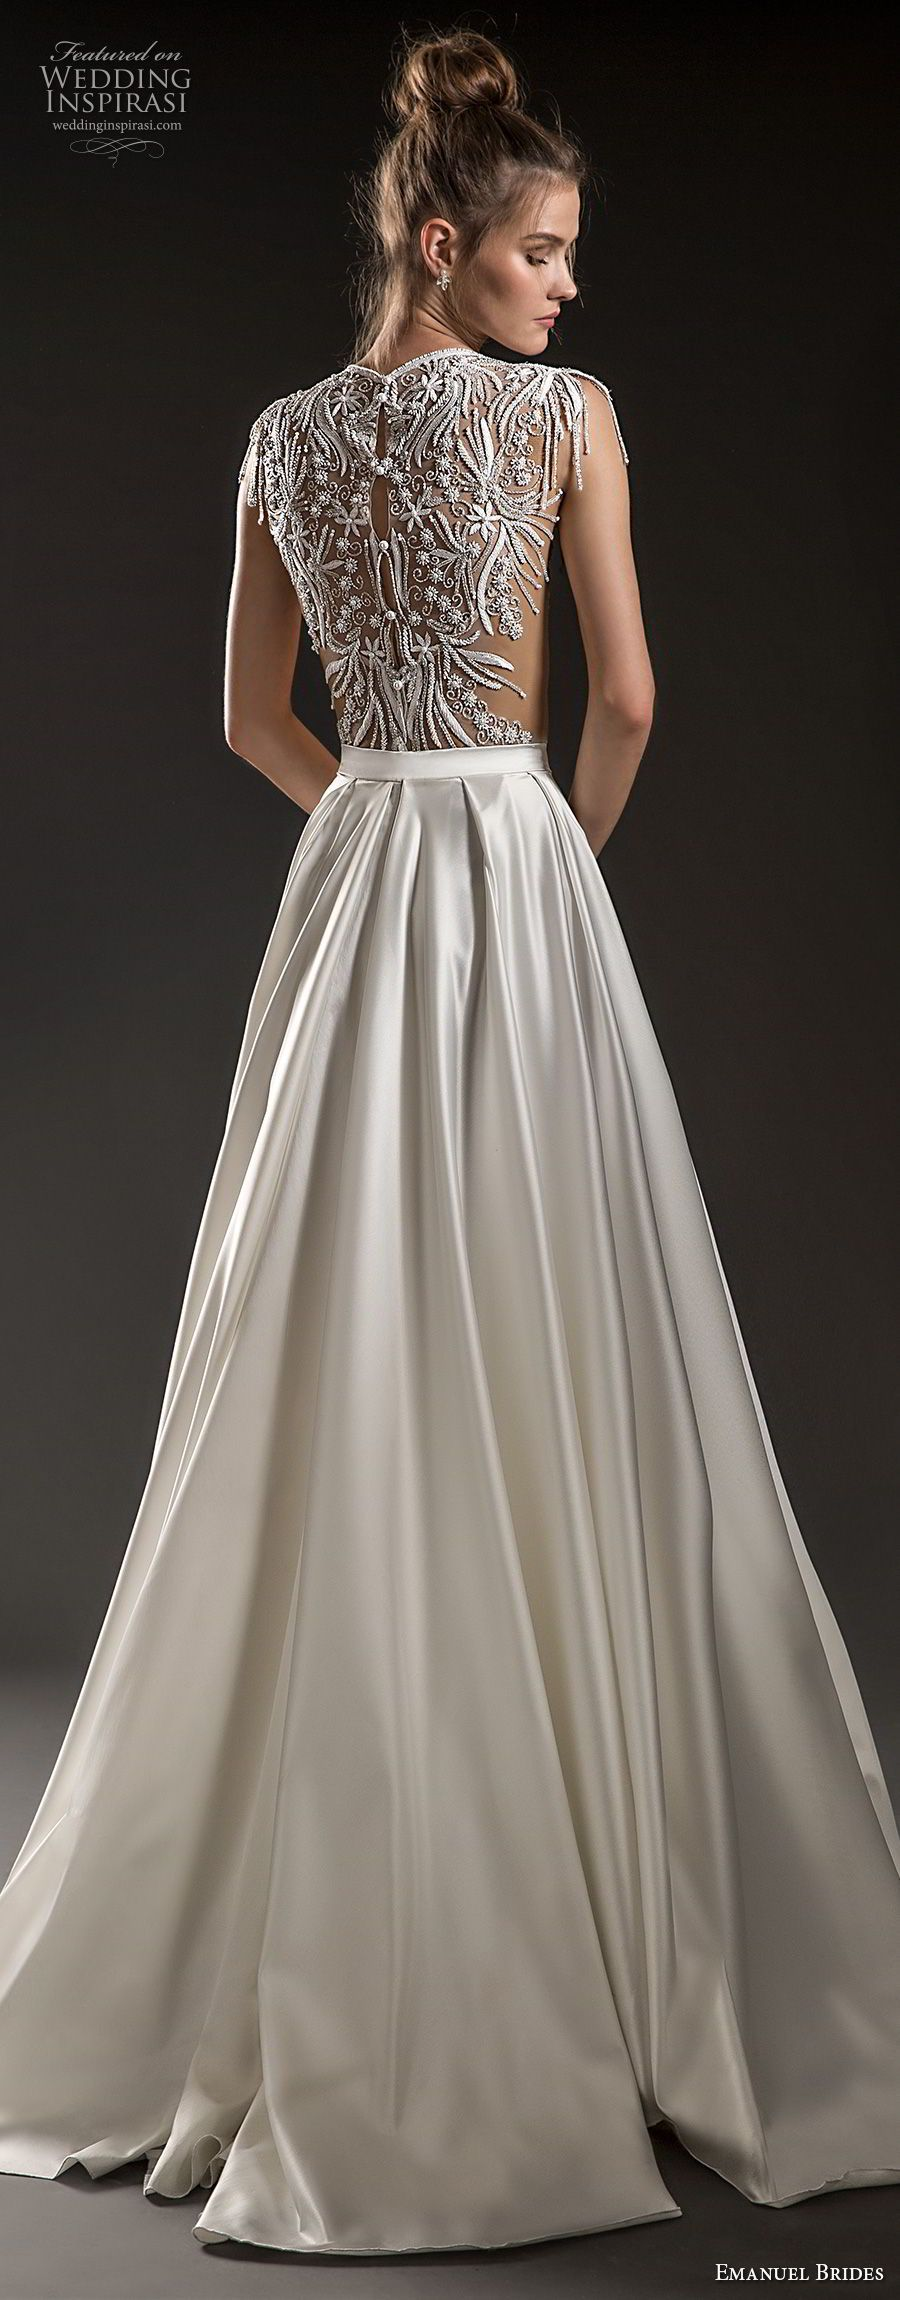 Lace cap sleeve a line wedding dress  Emanuel Brides  Wedding Dresses  Satin skirt Bodice and Neckline